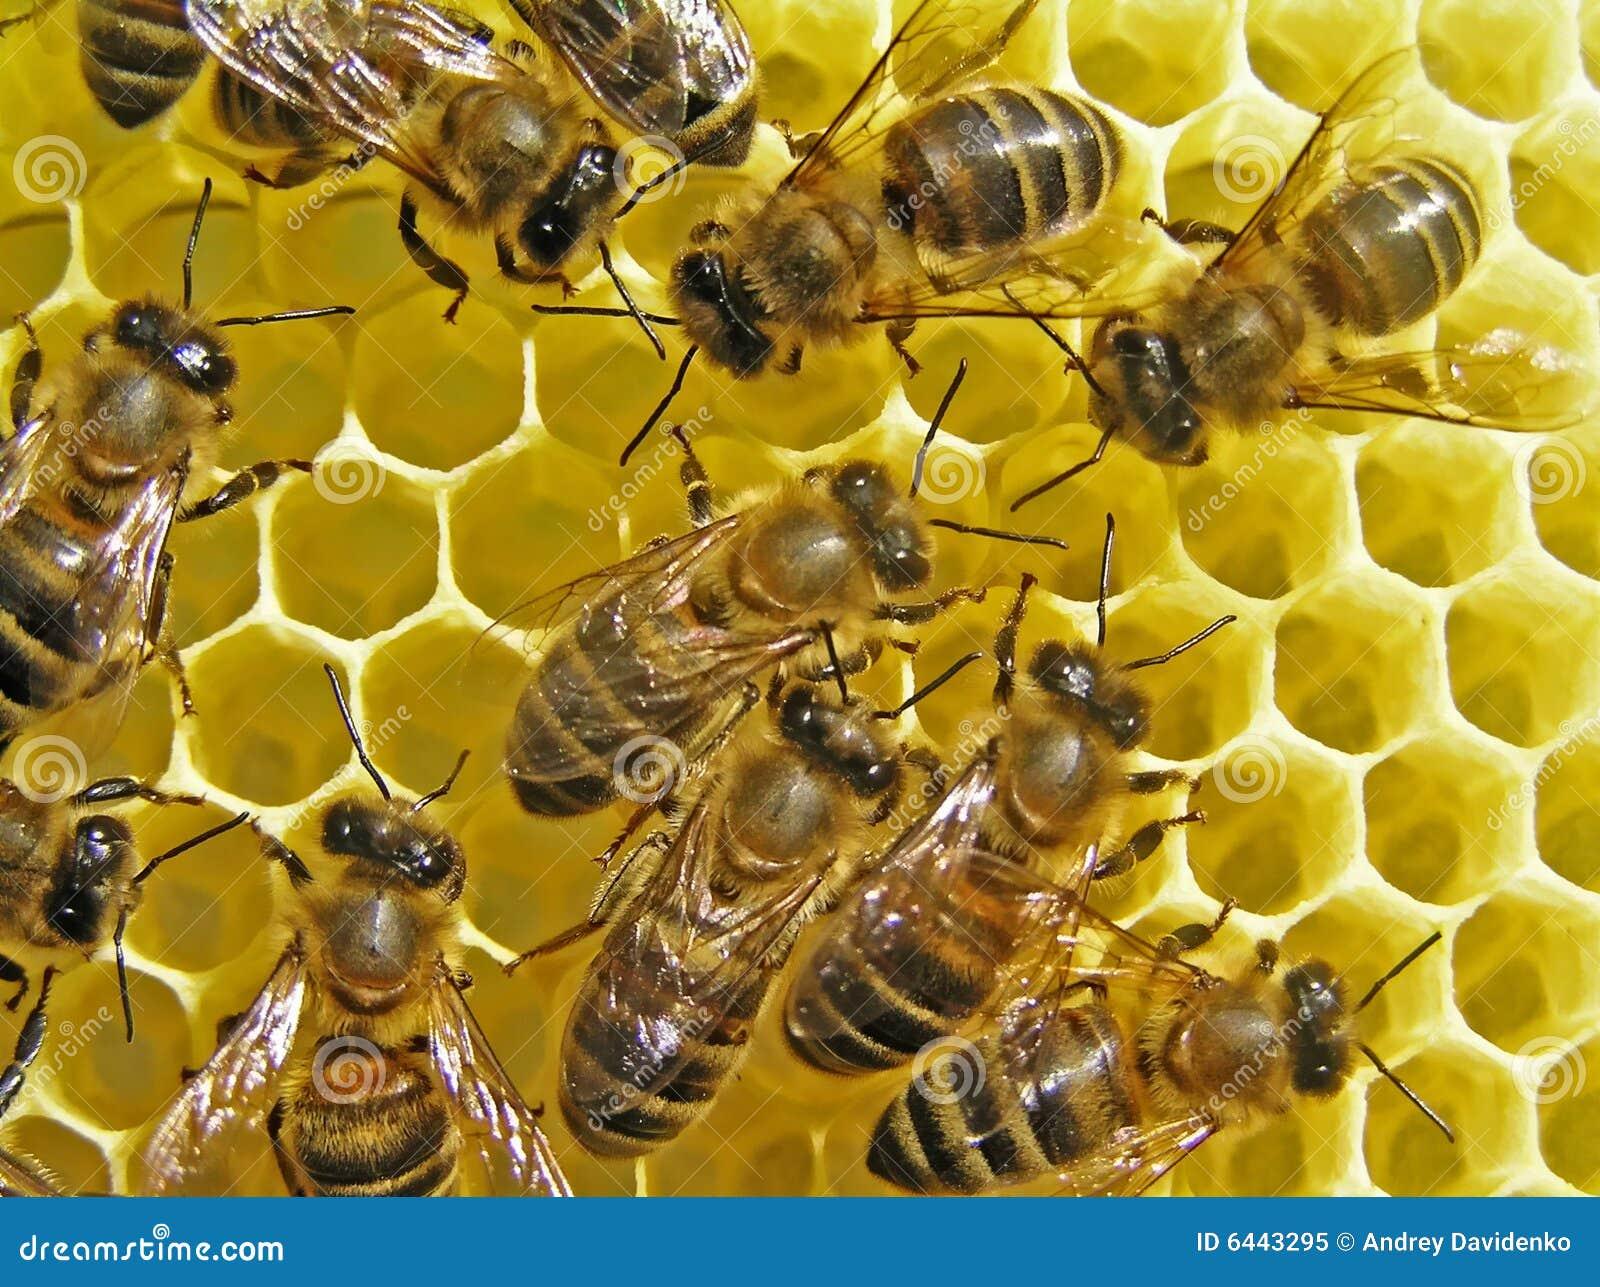 Bees build honeycombs.